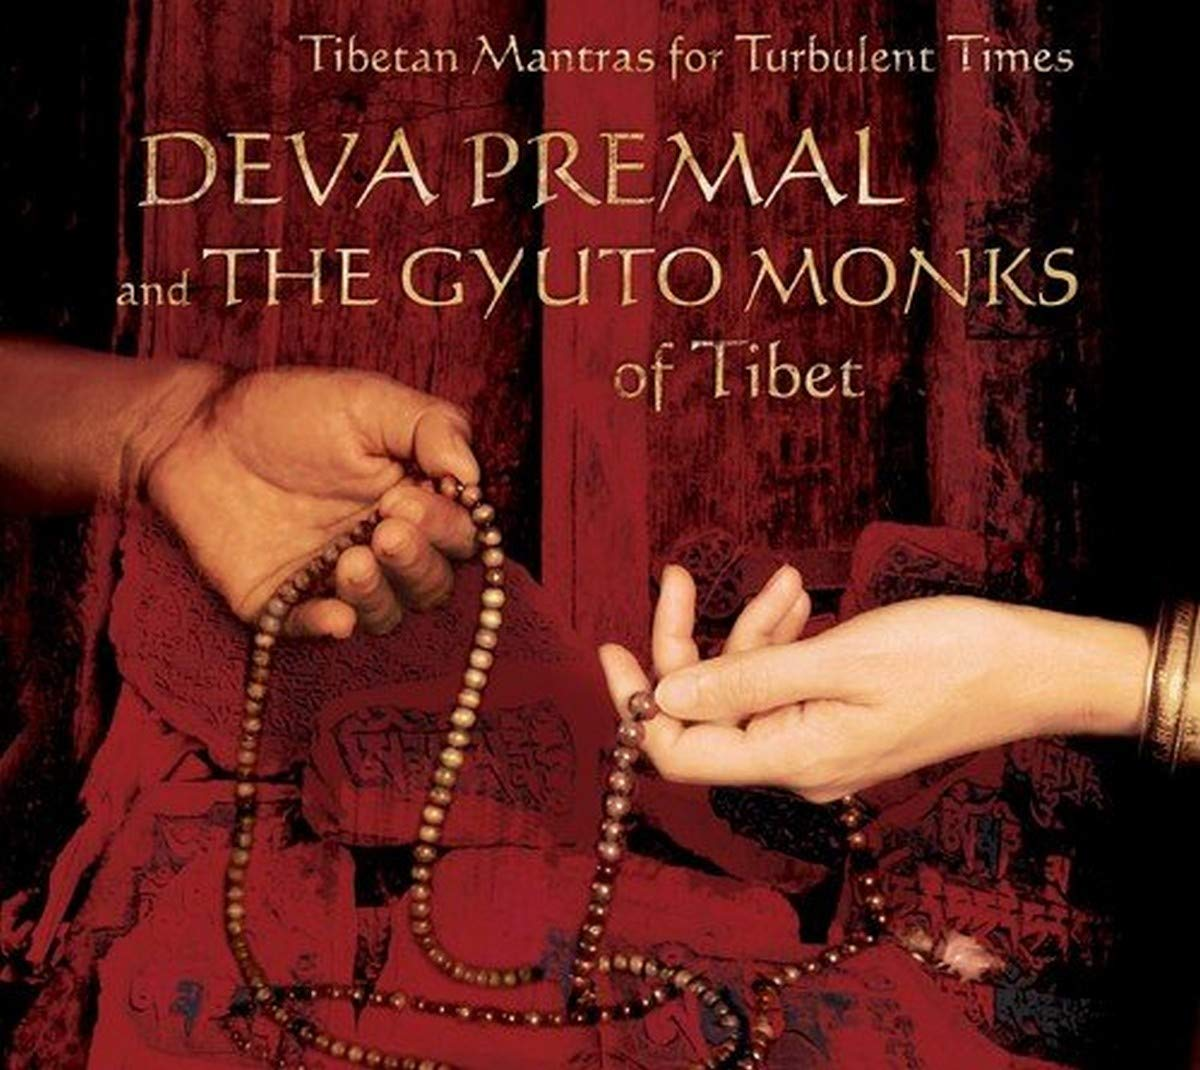 Tibetan mantras for turbulent